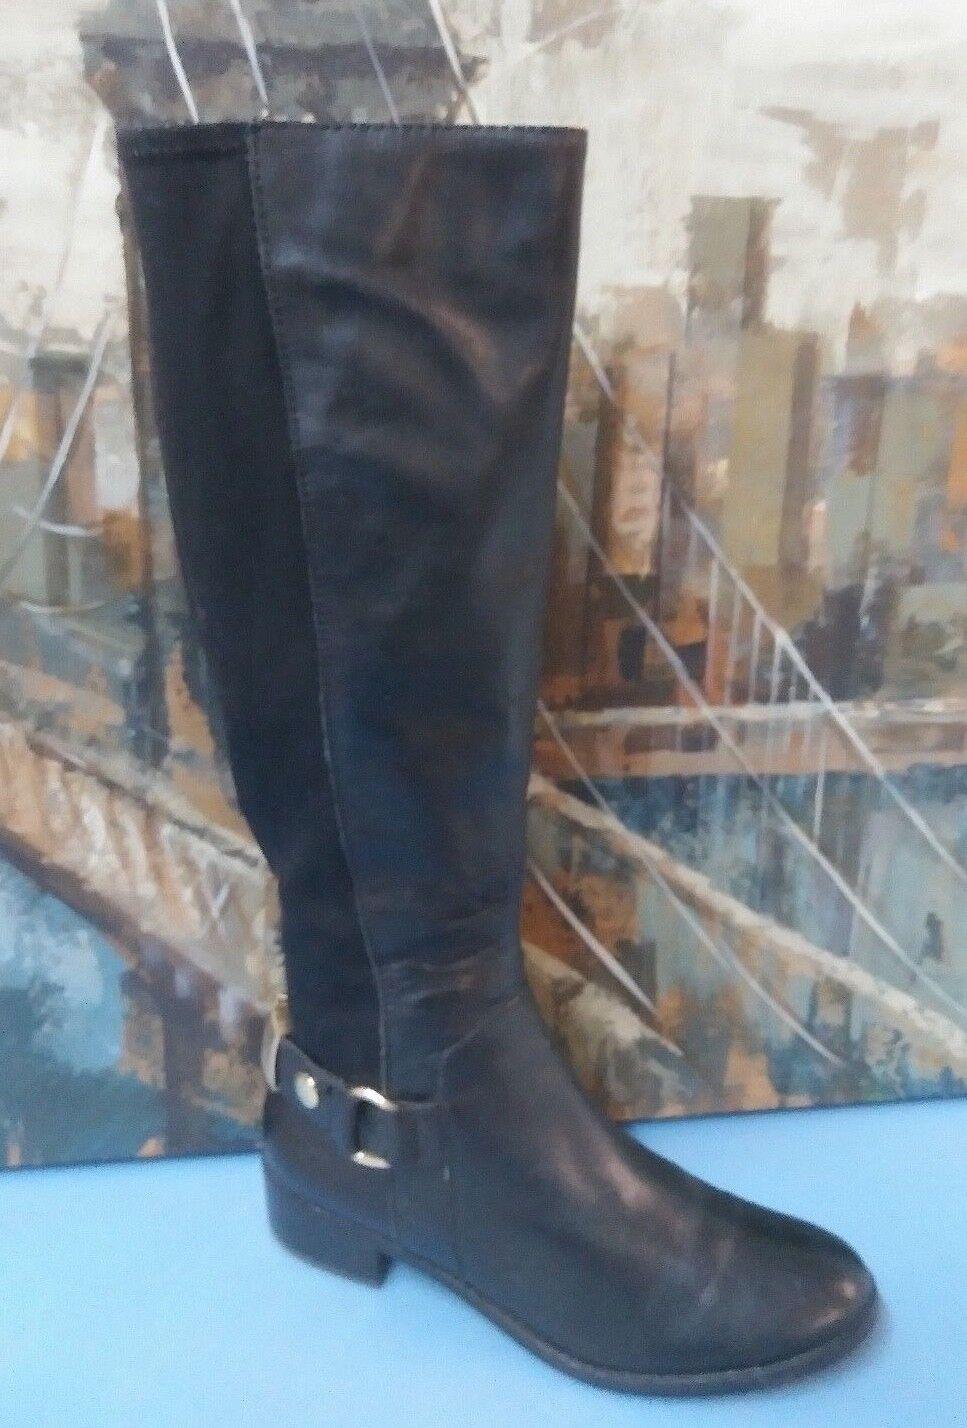 Steve Madden REGGIEE schwarz Leder Fabric Knee-High zip up Boot gold slides 7.5M